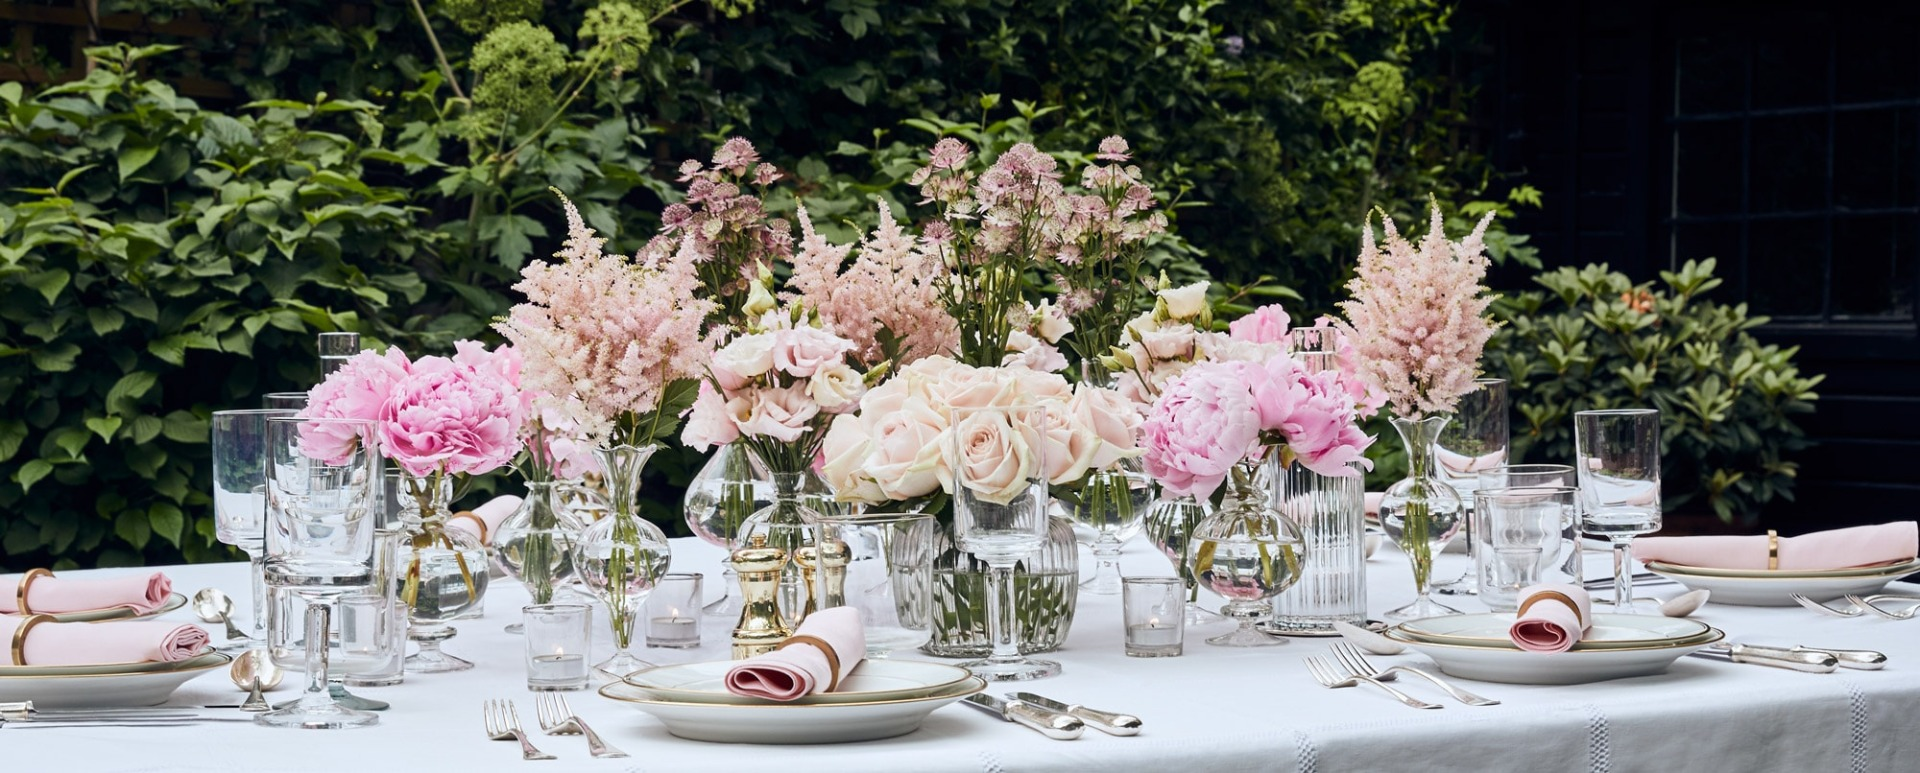 Garden-Table-CMS-01.jpg